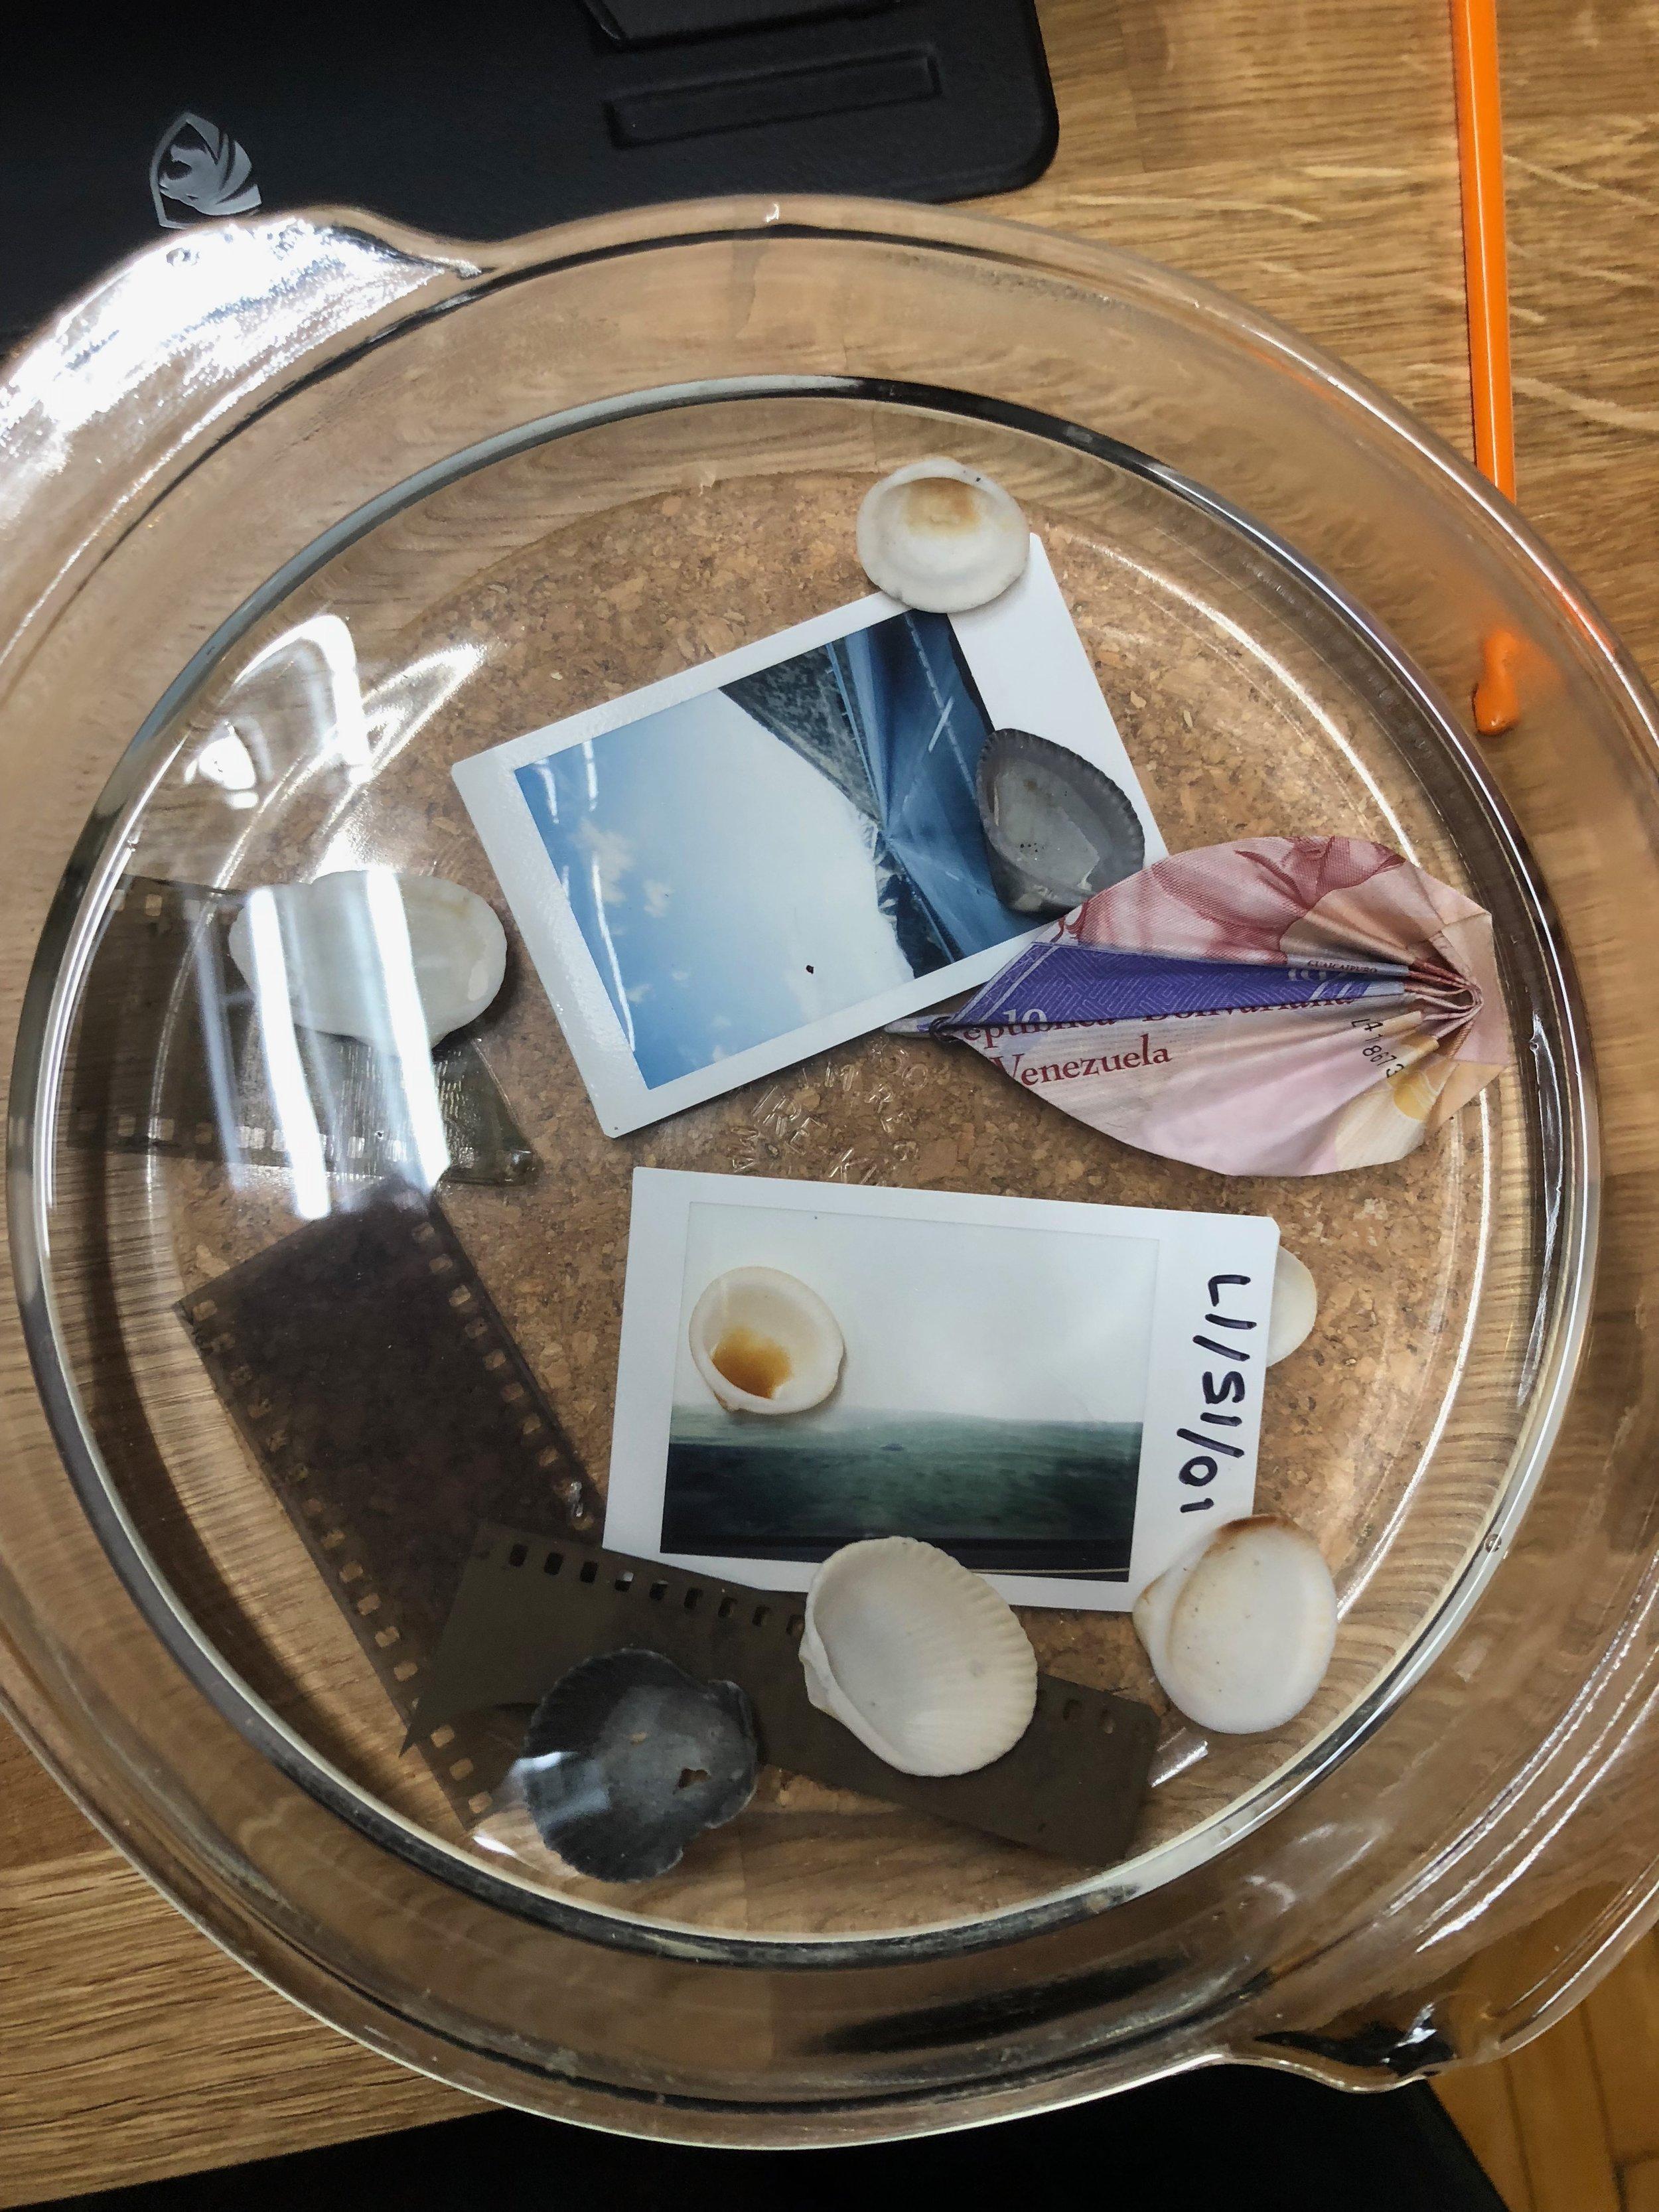 shells, polaroids, and Venezuelan money